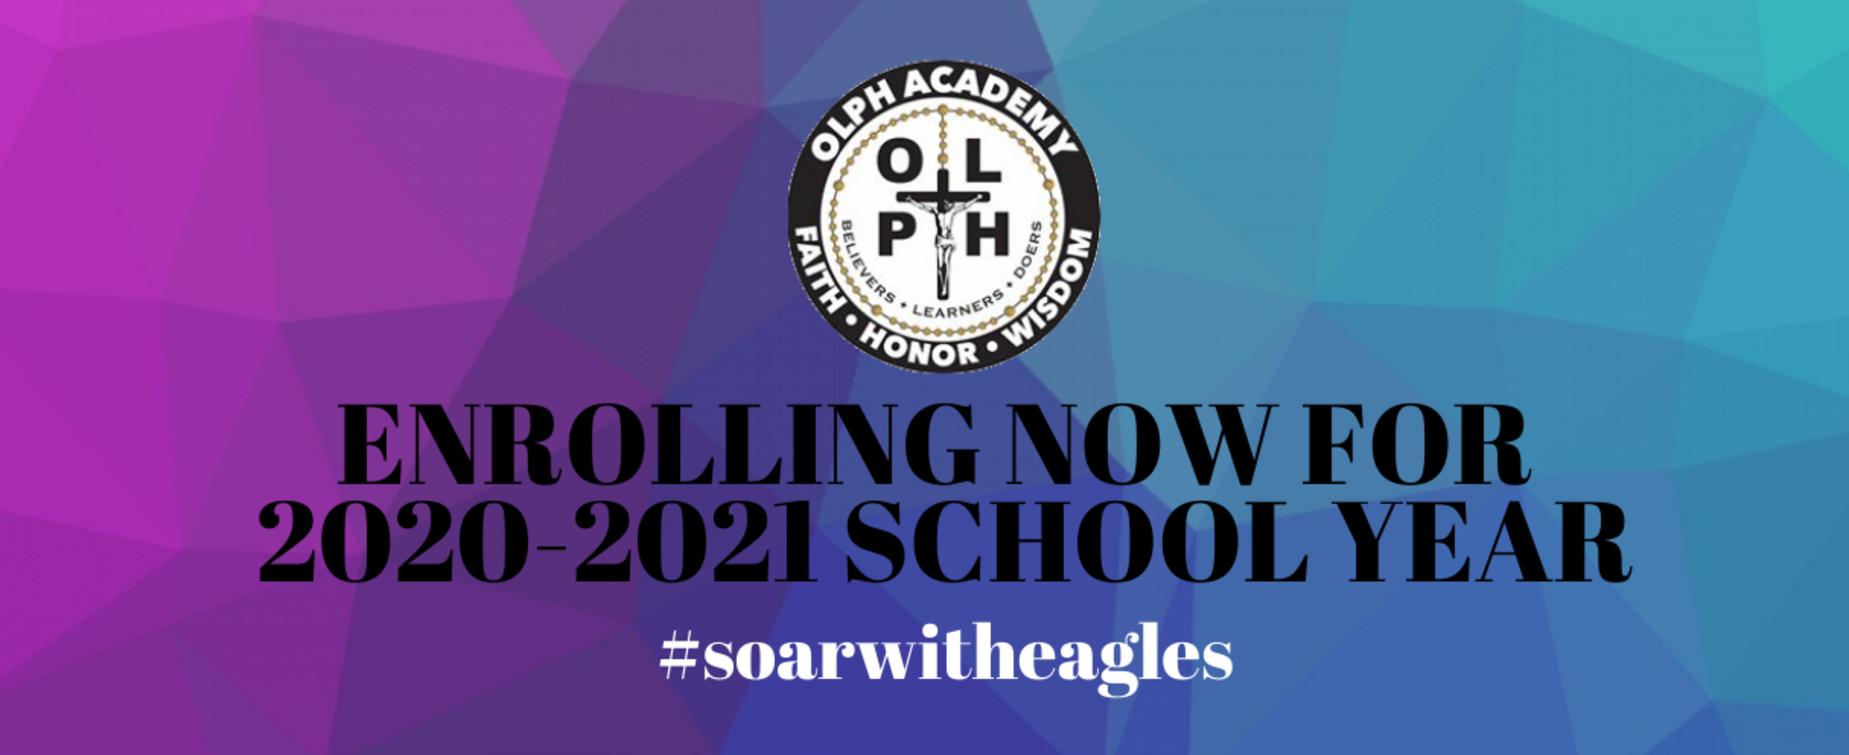 Enrolling now 2020-2021